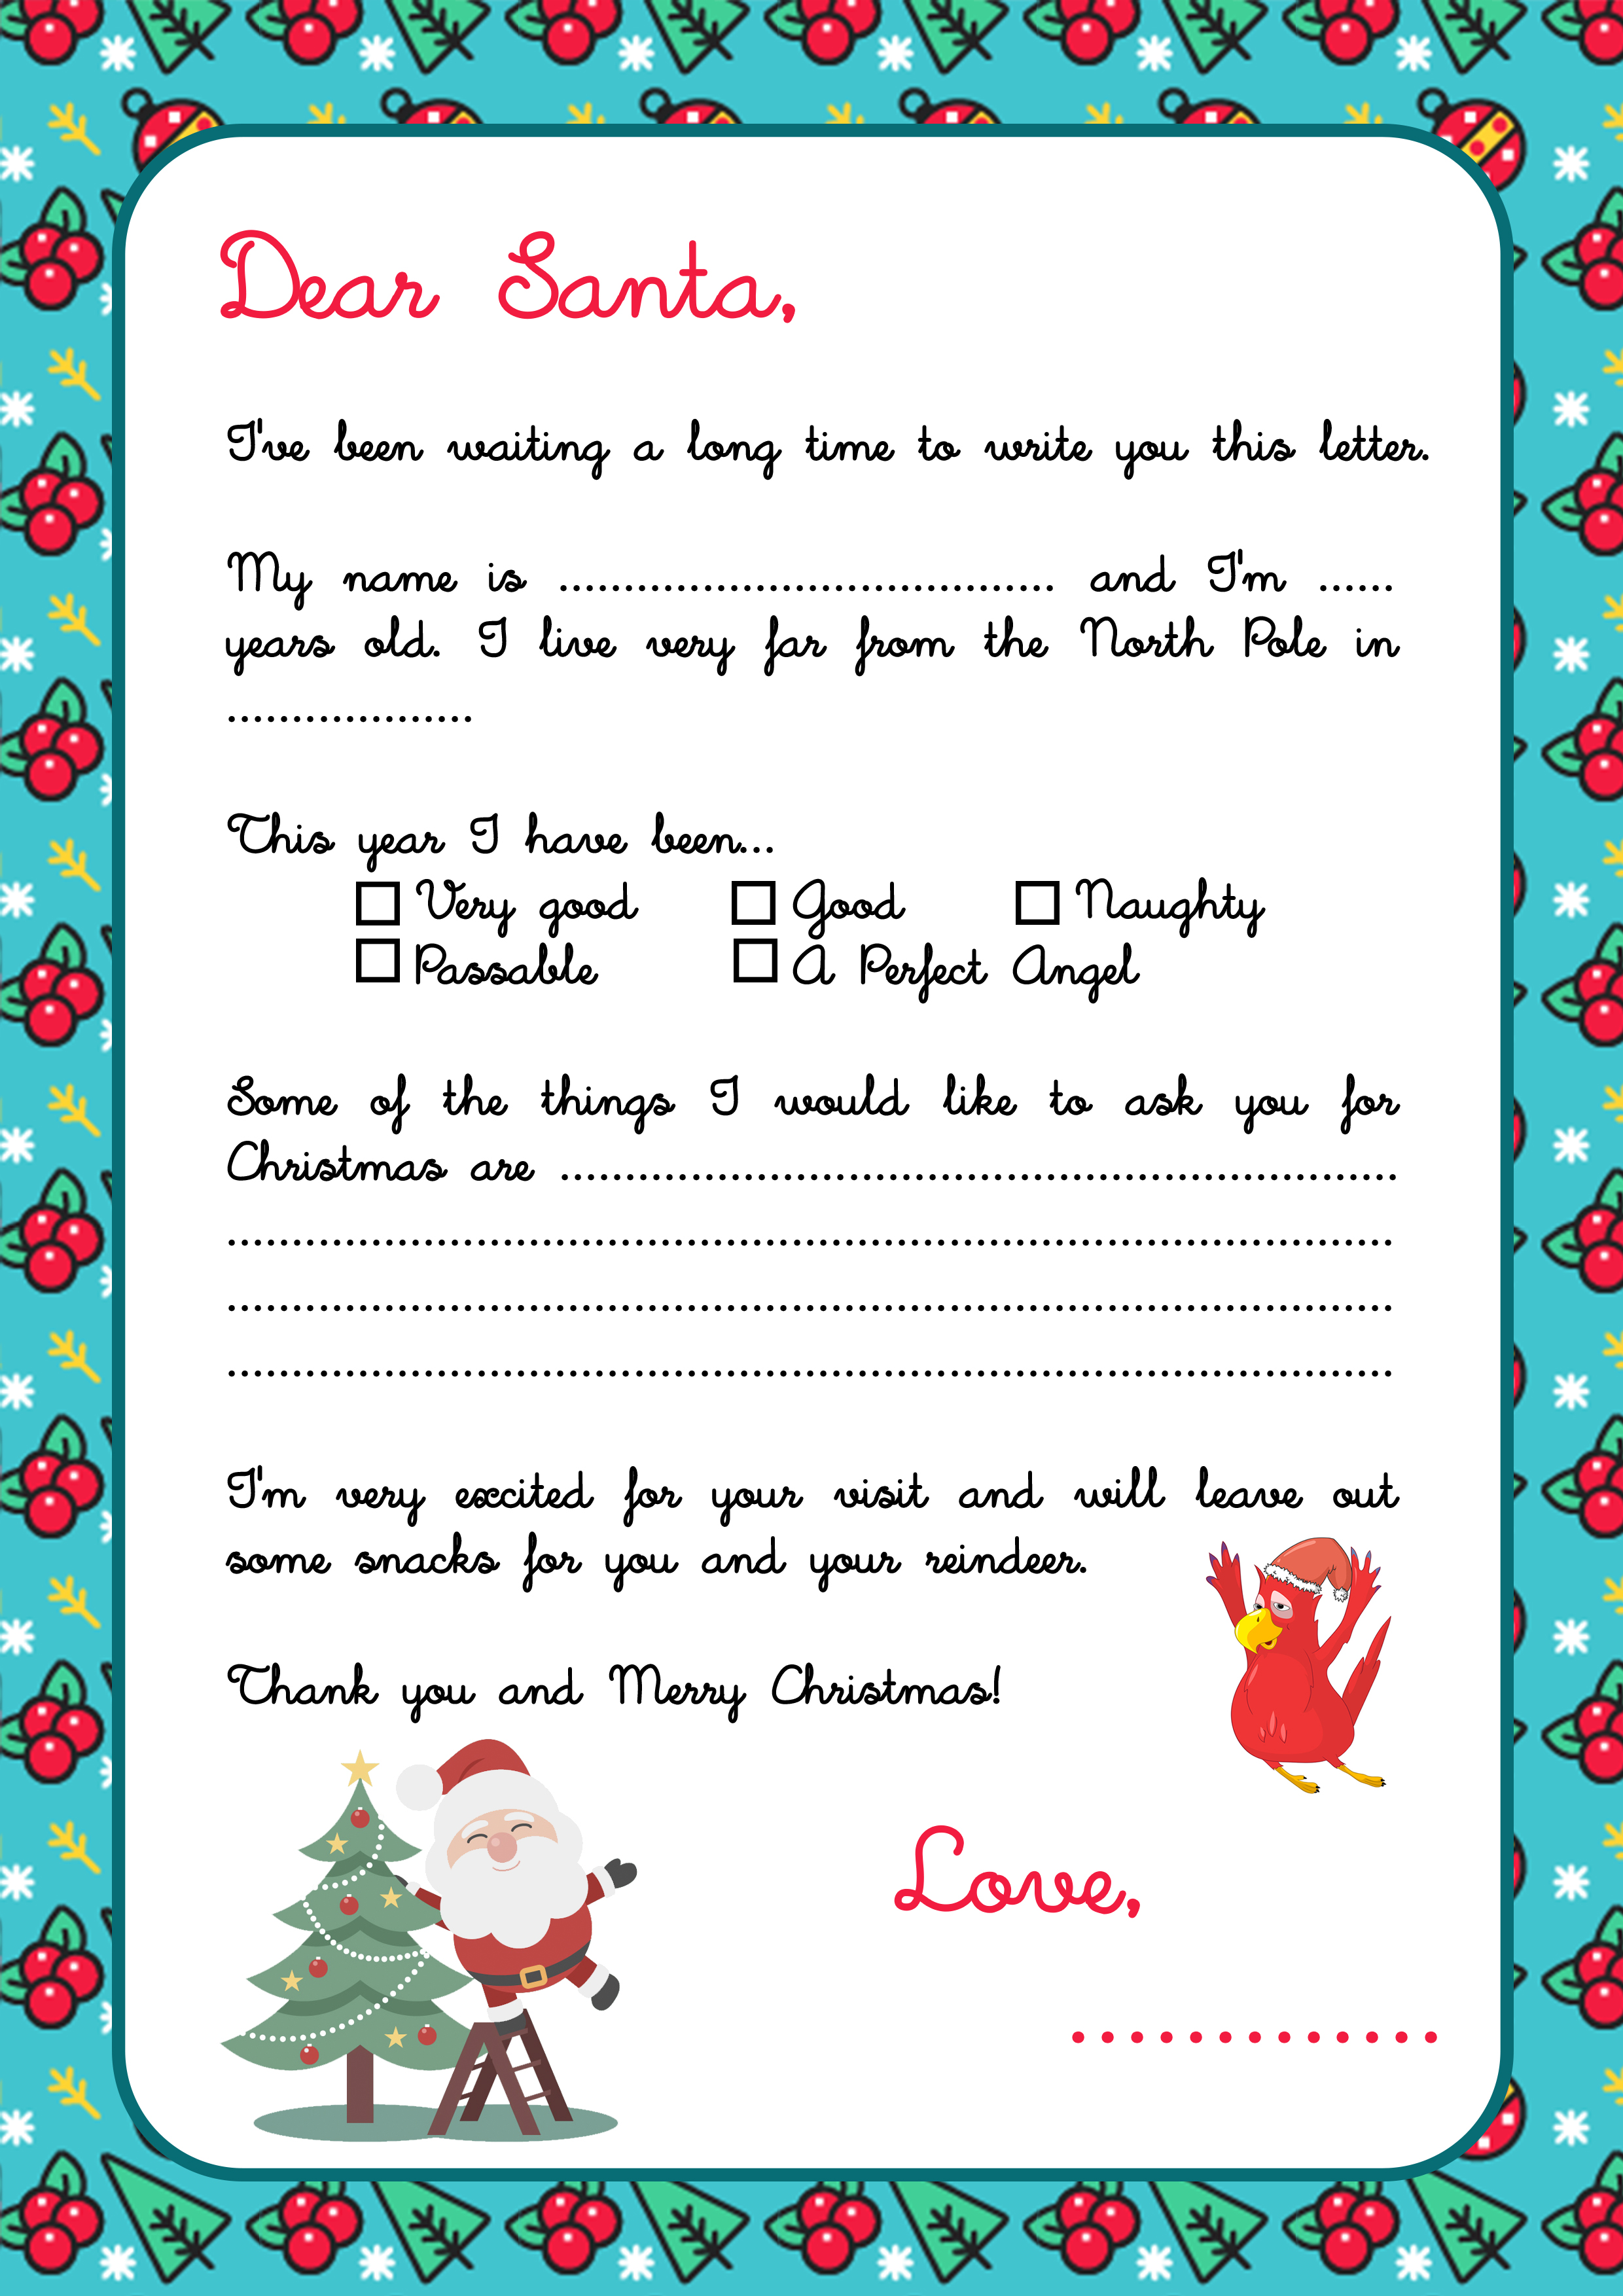 Plantilla Carta para Santa Claus Papa Noel en inglés - Letter for Santa